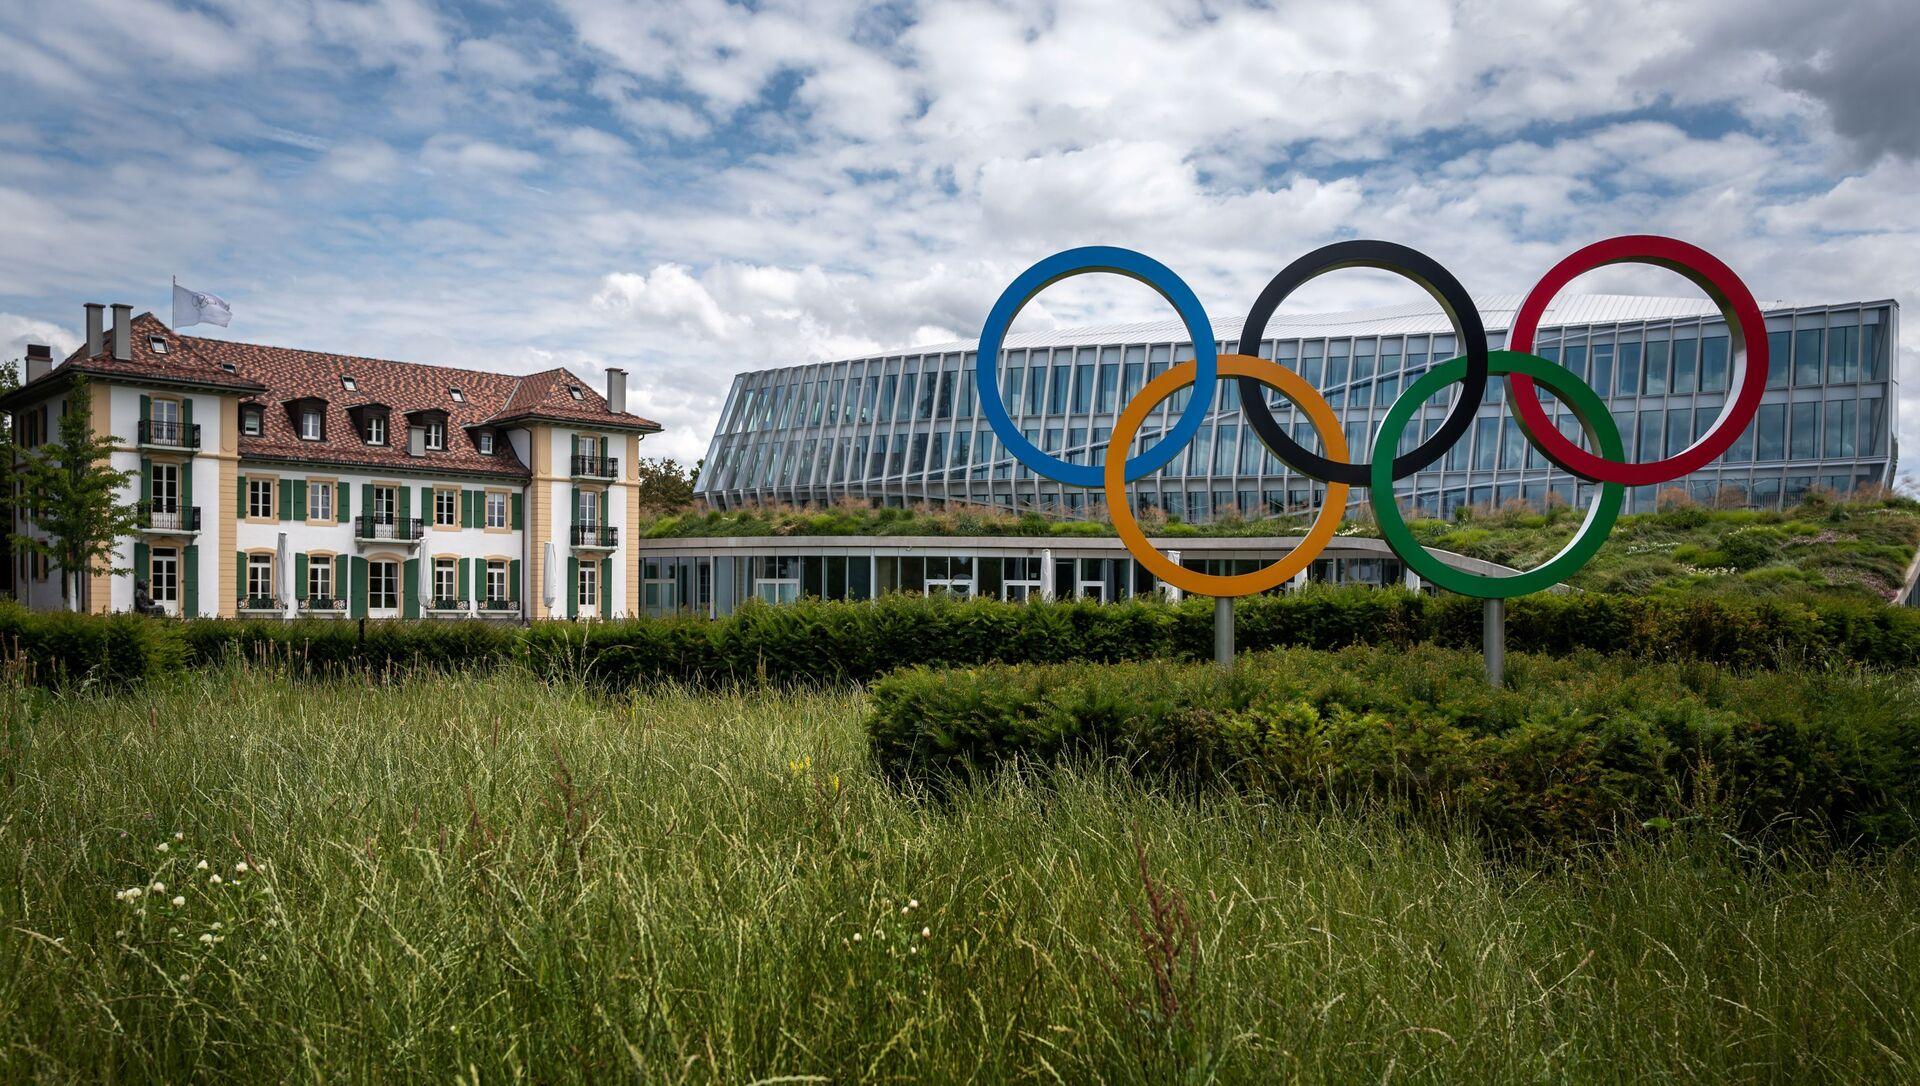 Логотип Олимпийских Игр перед штаб-квартирой МОК в Лозанне, фото из архива - Sputnik Азербайджан, 1920, 13.08.2021